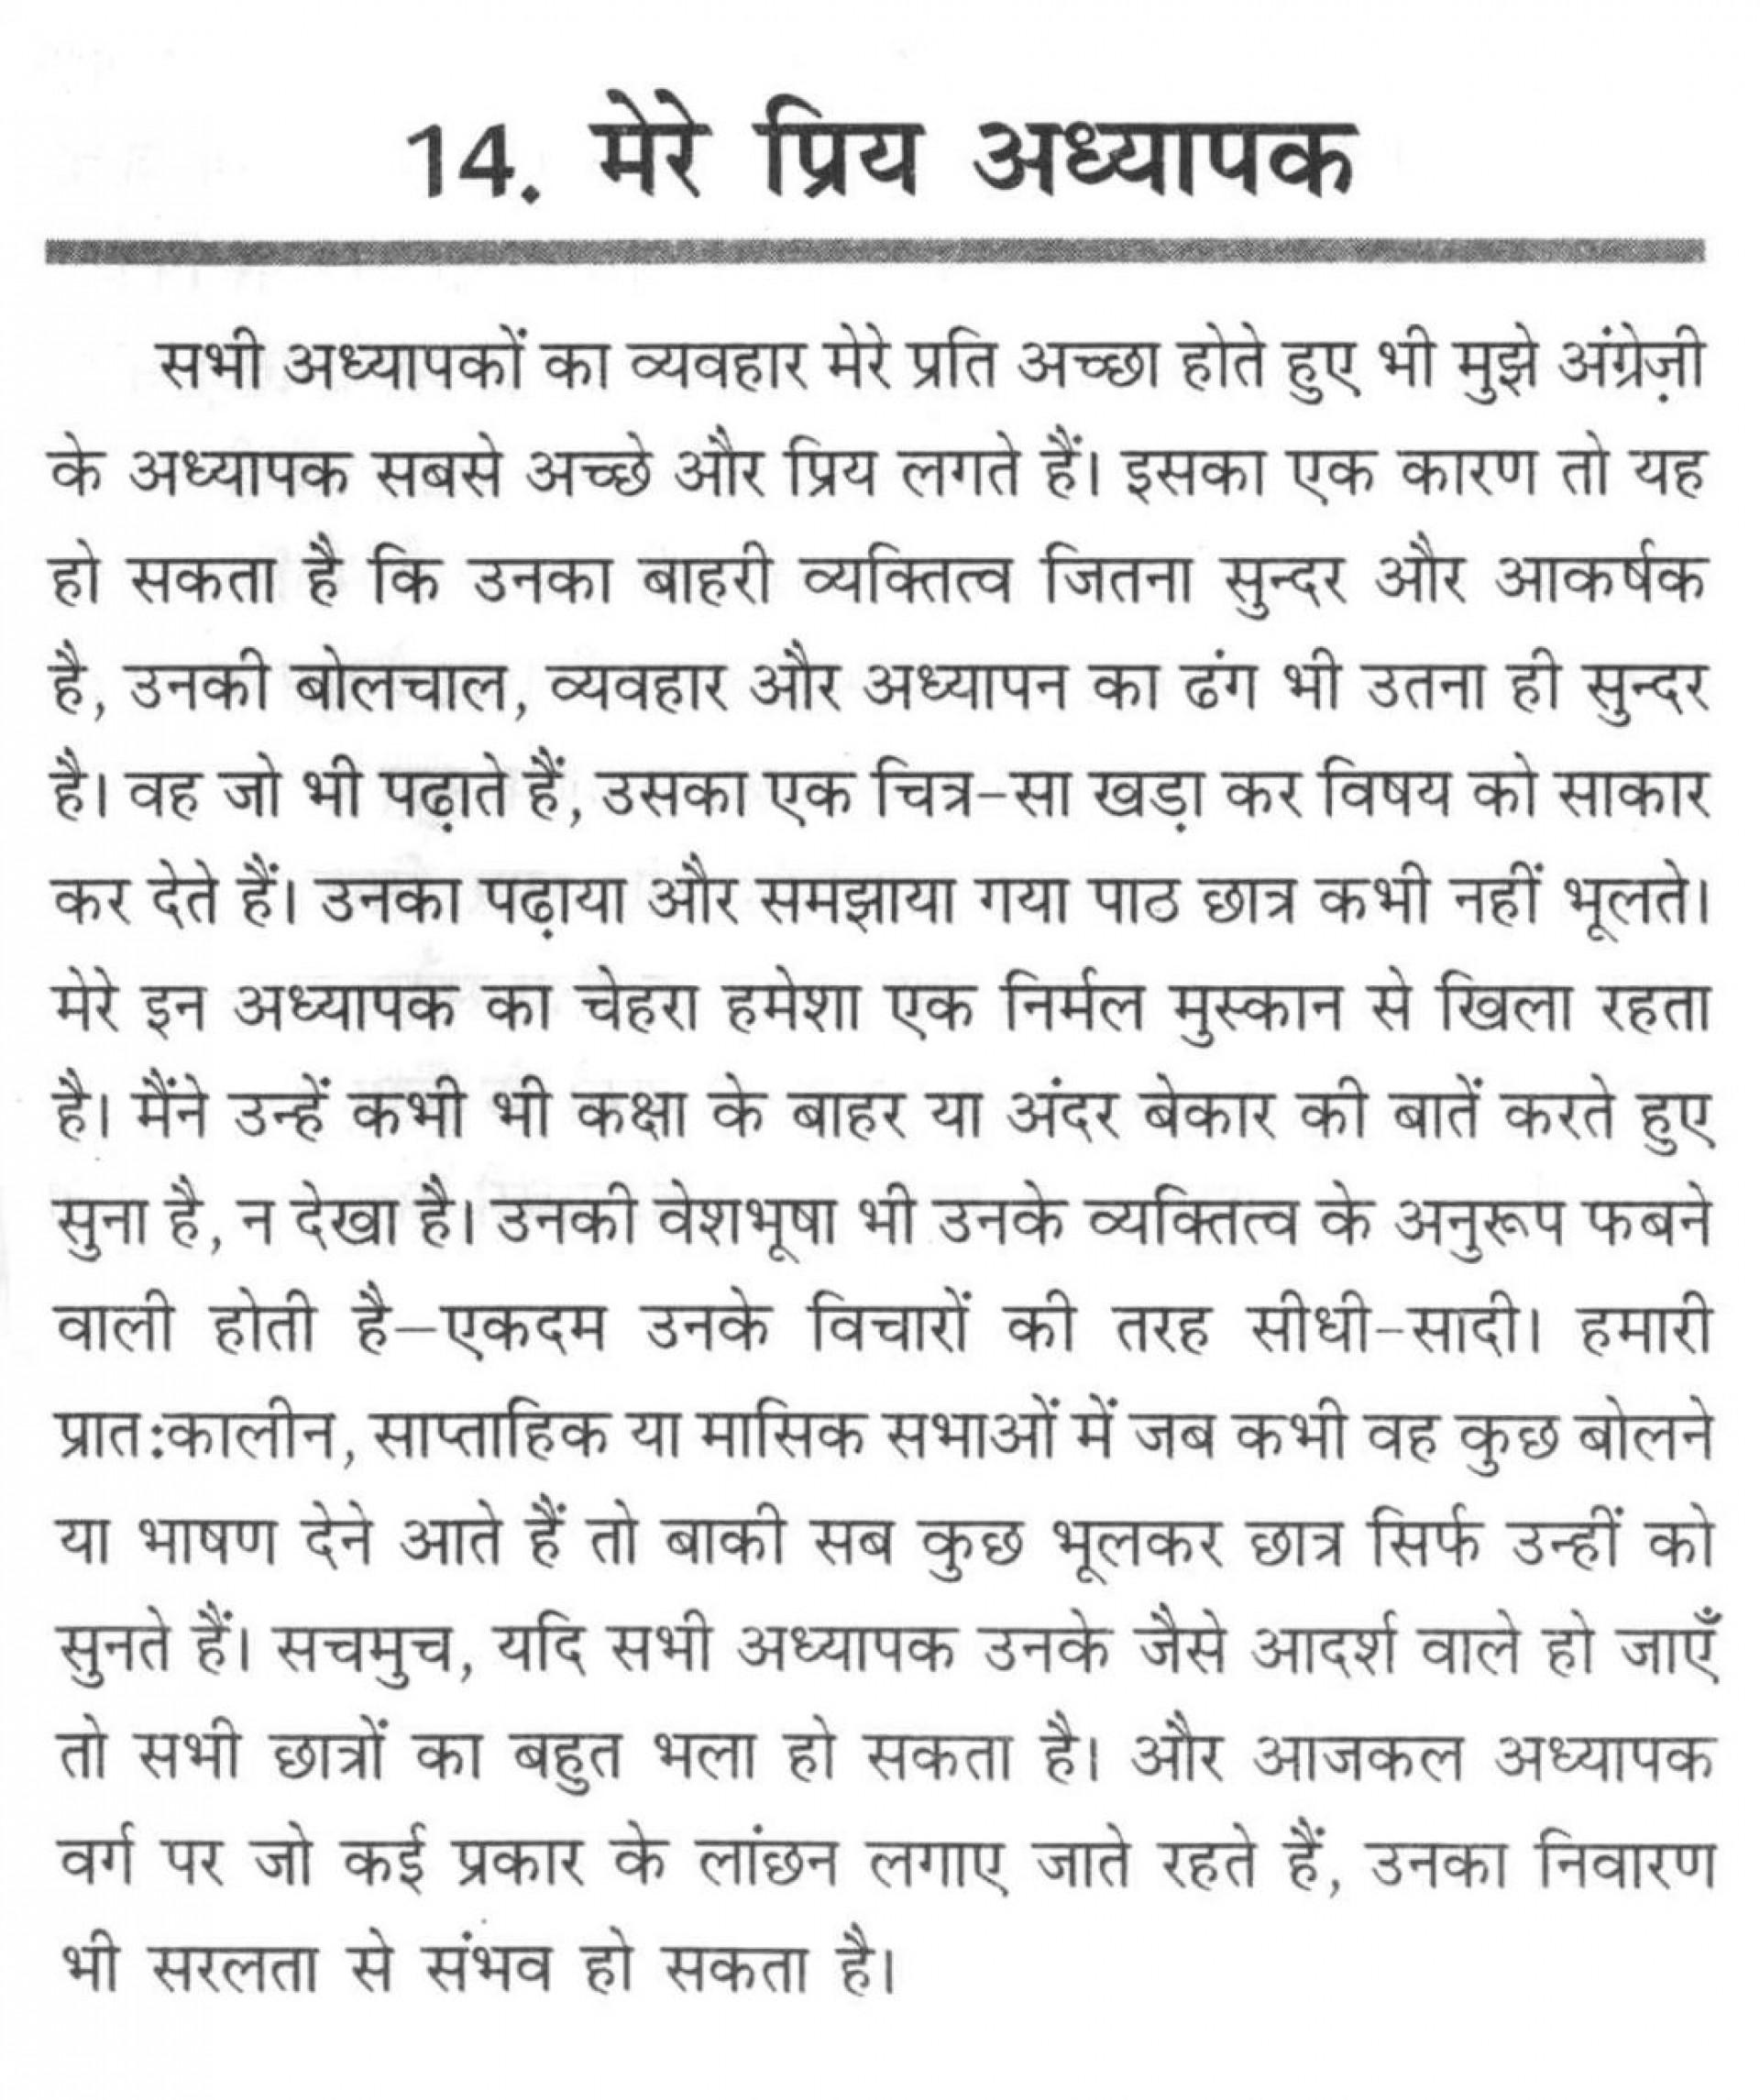 007 Qualities Of Good Friend Essay Buying Student Pdf In Telugu Punjabi Successful English Traits Leader Words Hindi Urdu 1048x1251 Example Amazing Friends A Conclusion Spm 1920